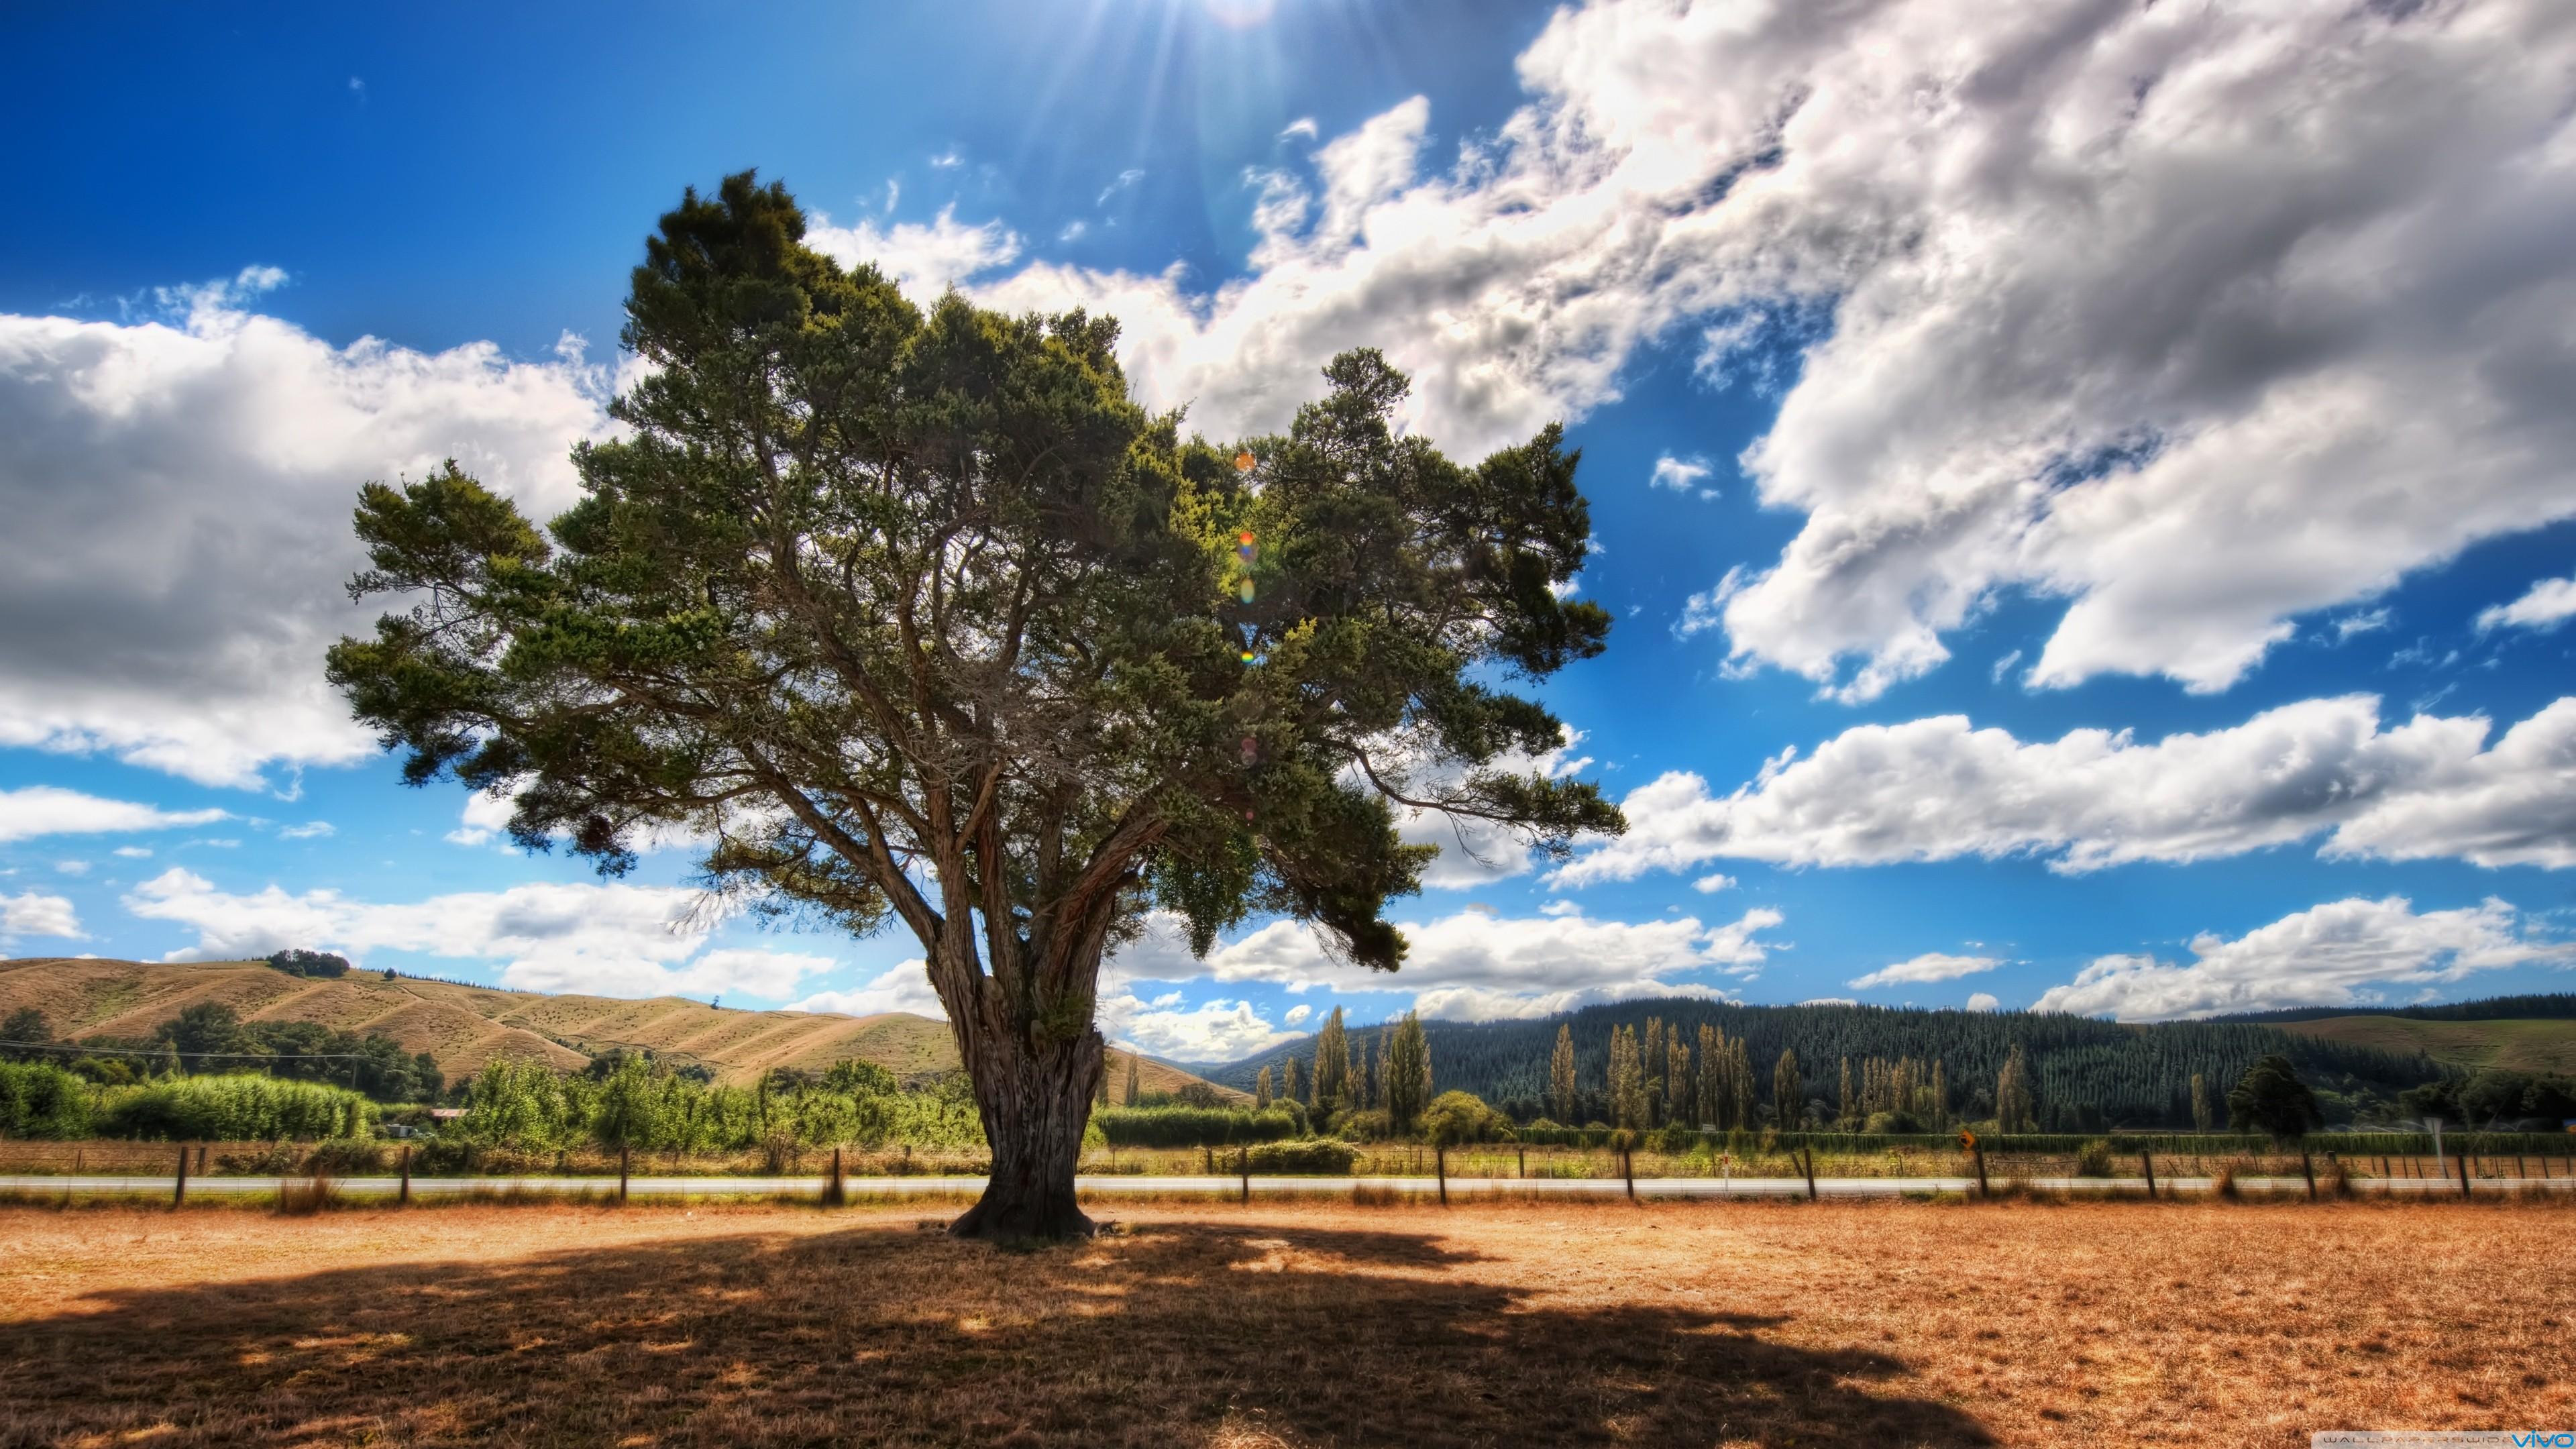 solitary_tree_3-wallpaper-3840x2160.jpg